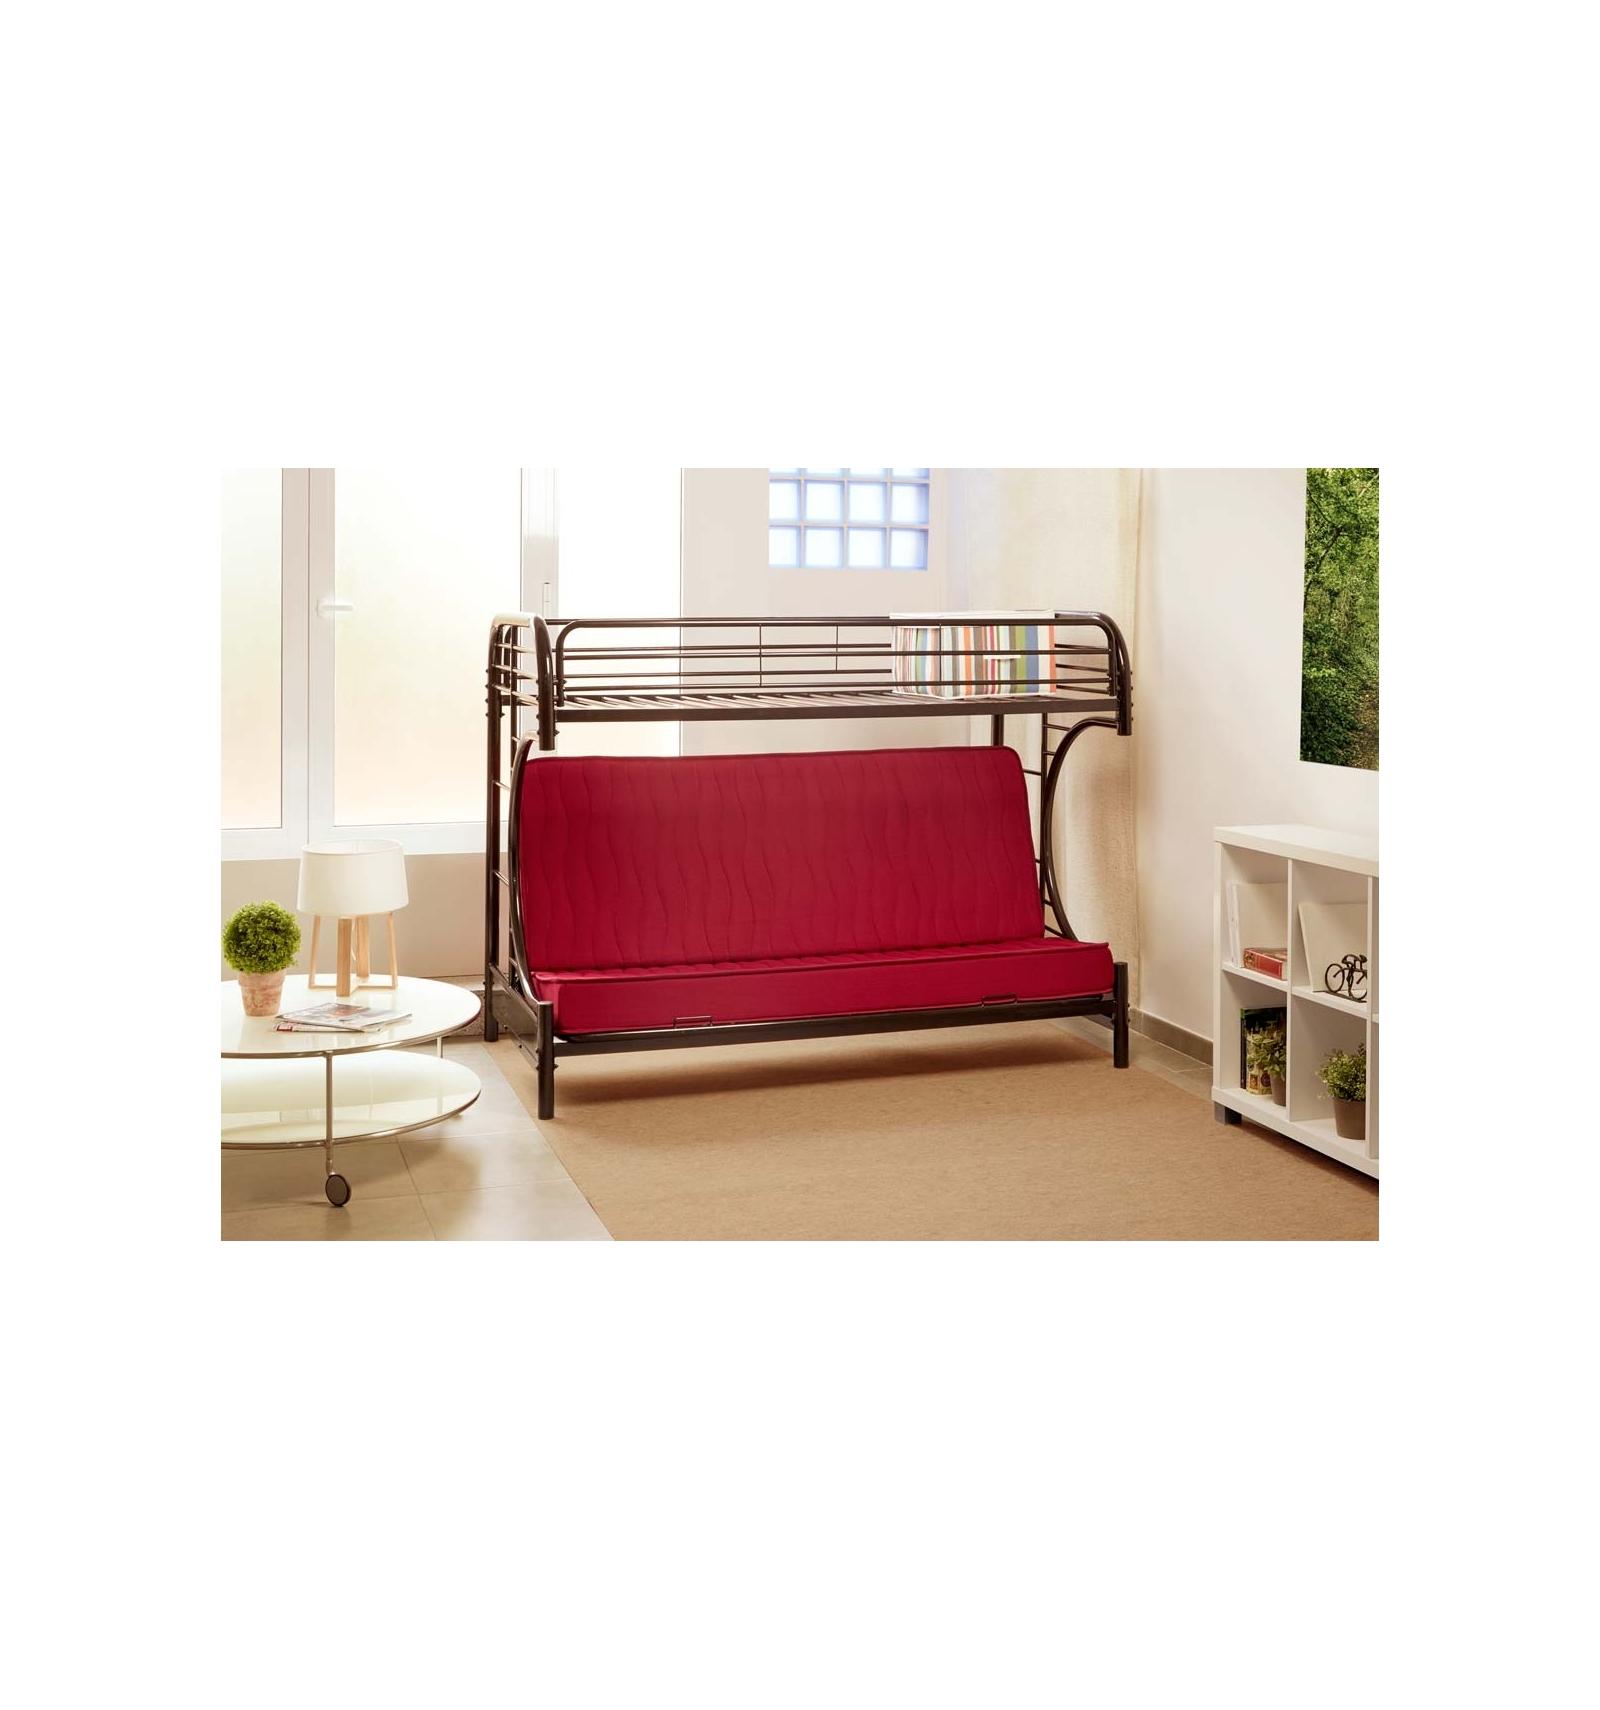 lit mezzanine canap. Black Bedroom Furniture Sets. Home Design Ideas